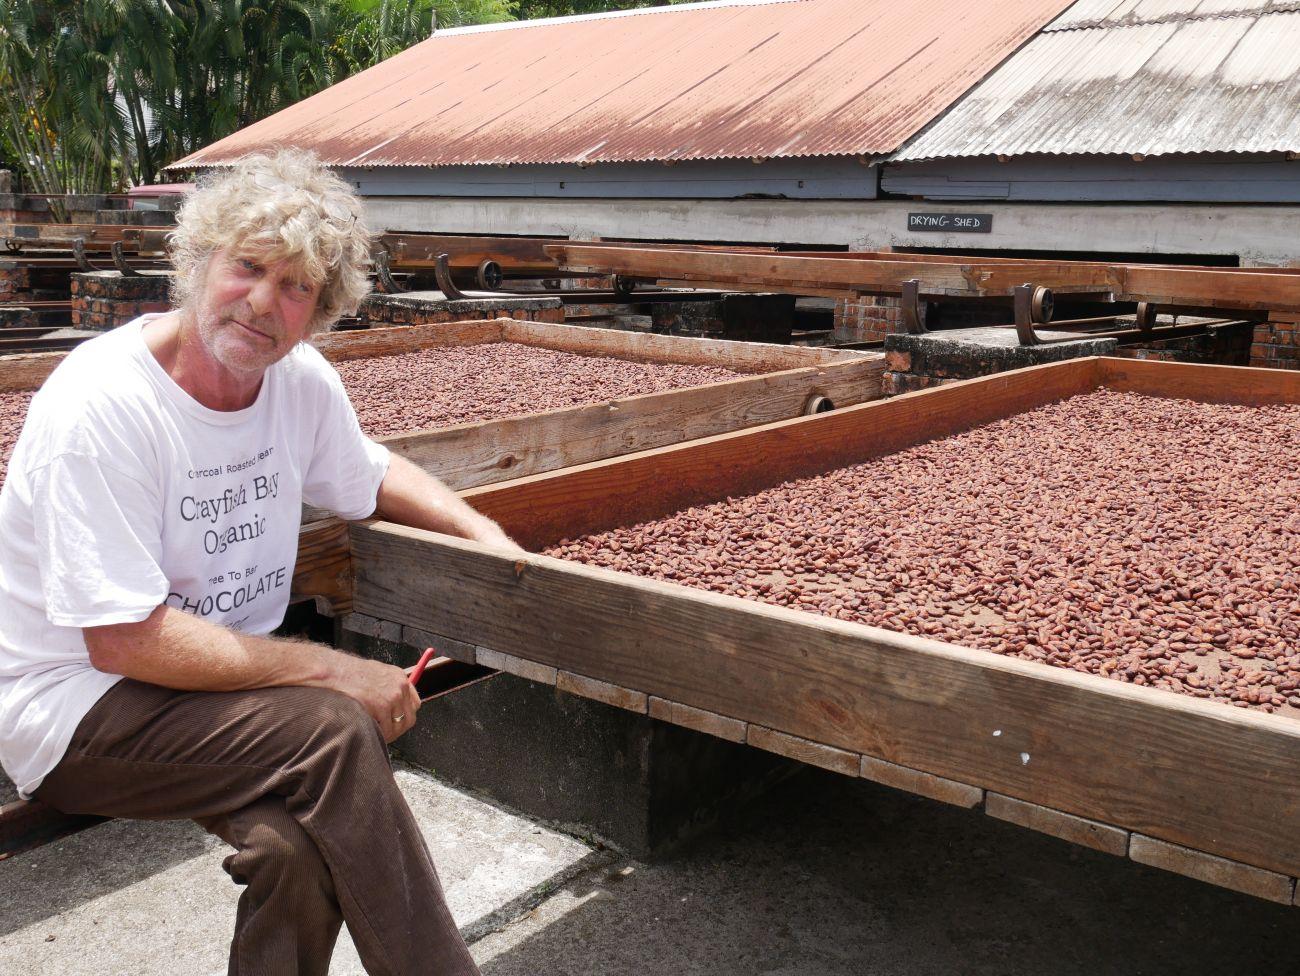 Kim Russell, Crayfish Bay Organics